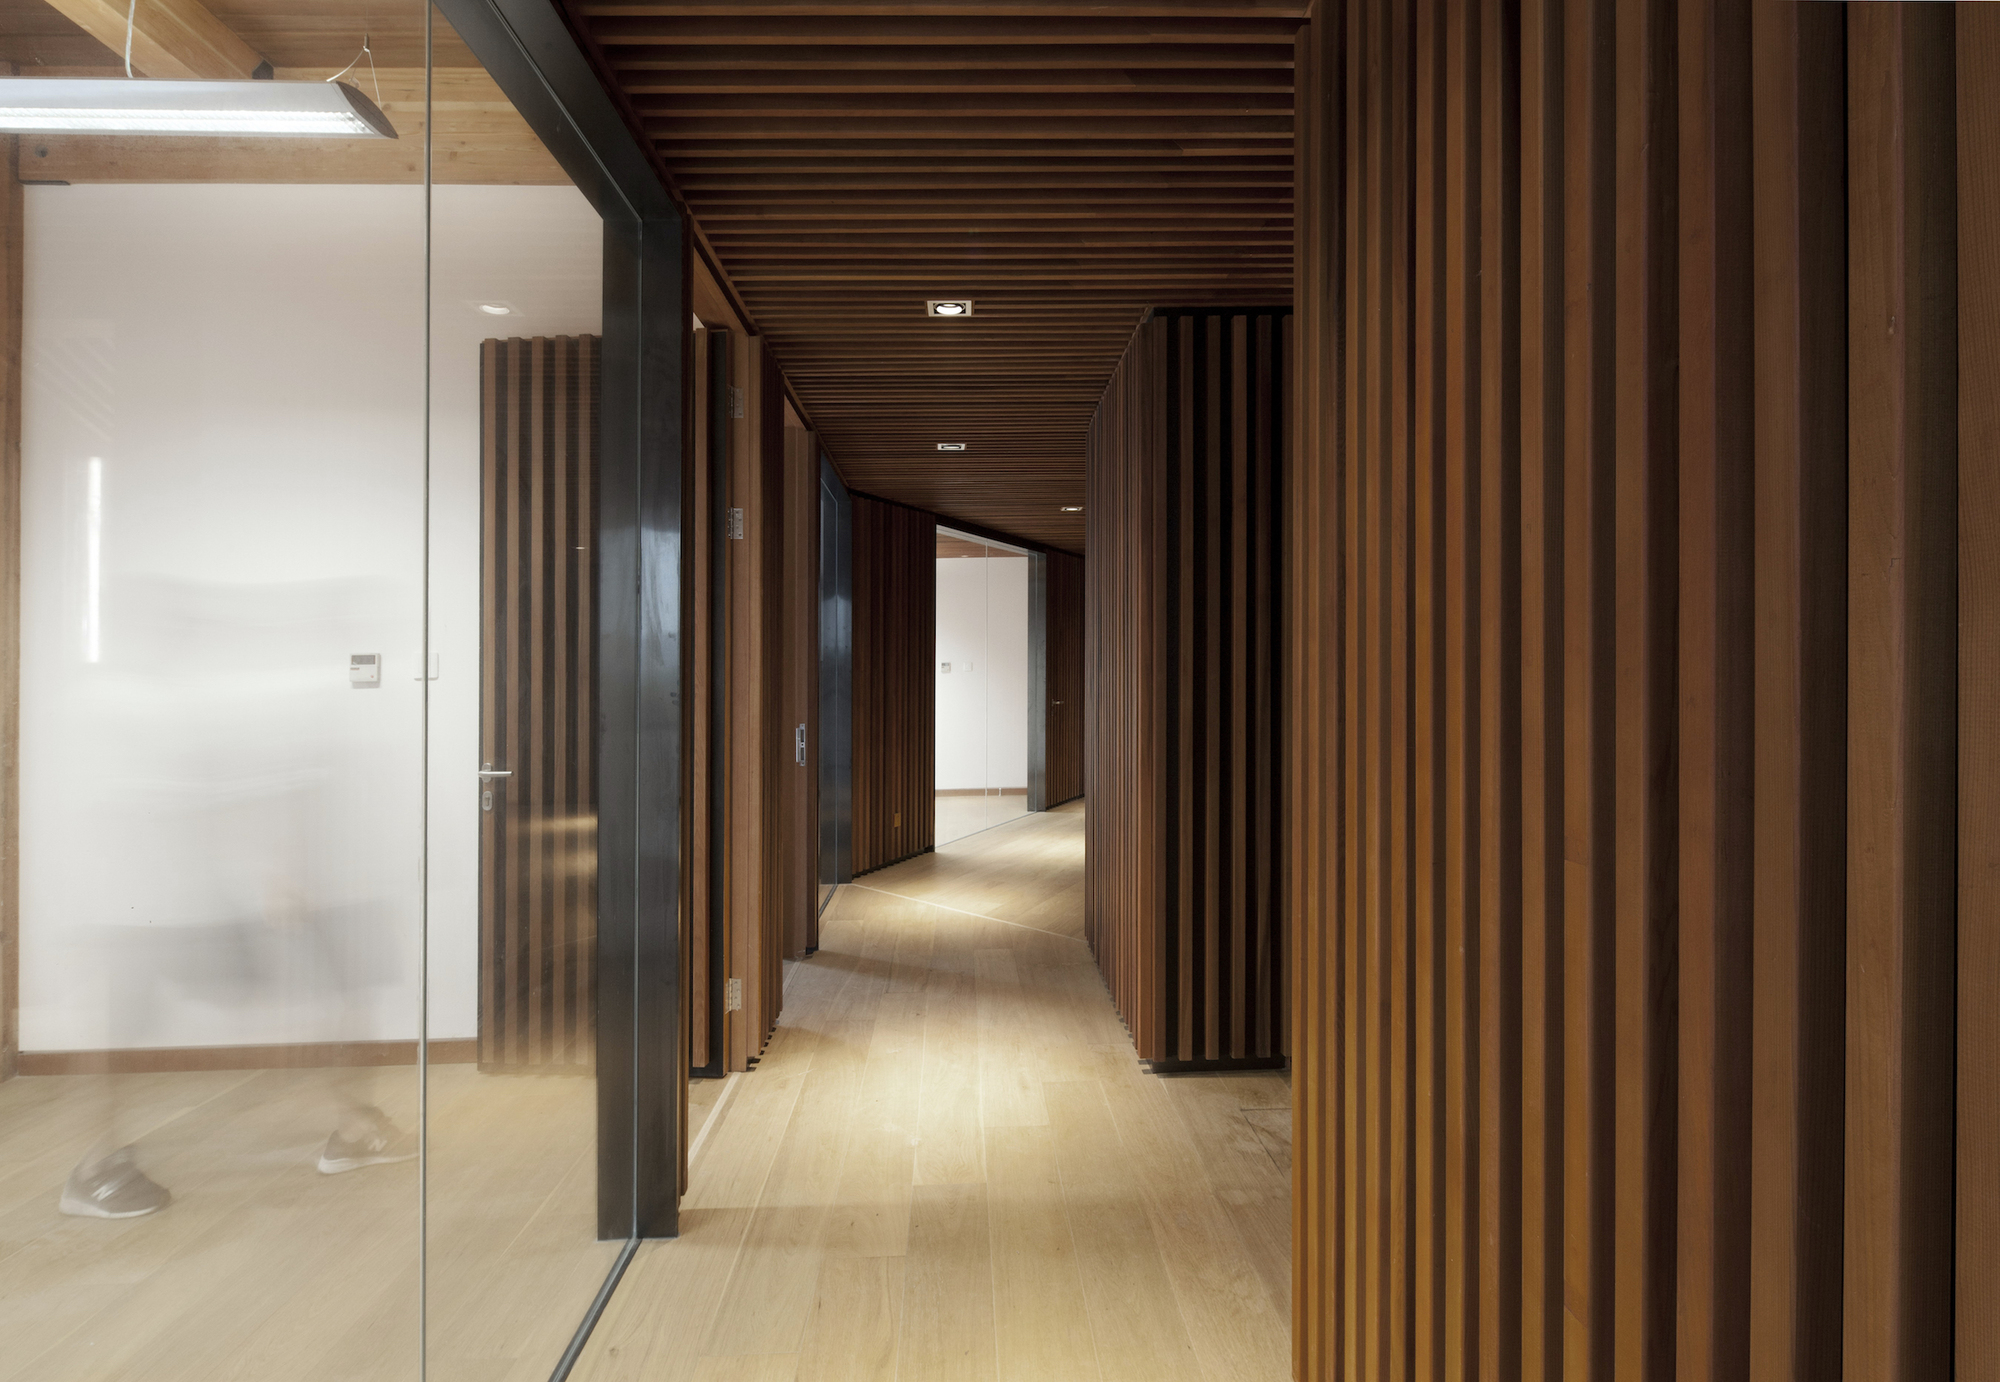 Galeria De Pavilho De Madeira Fmd Architects 12 Interiors Inside Ideas Interiors design about Everything [magnanprojects.com]